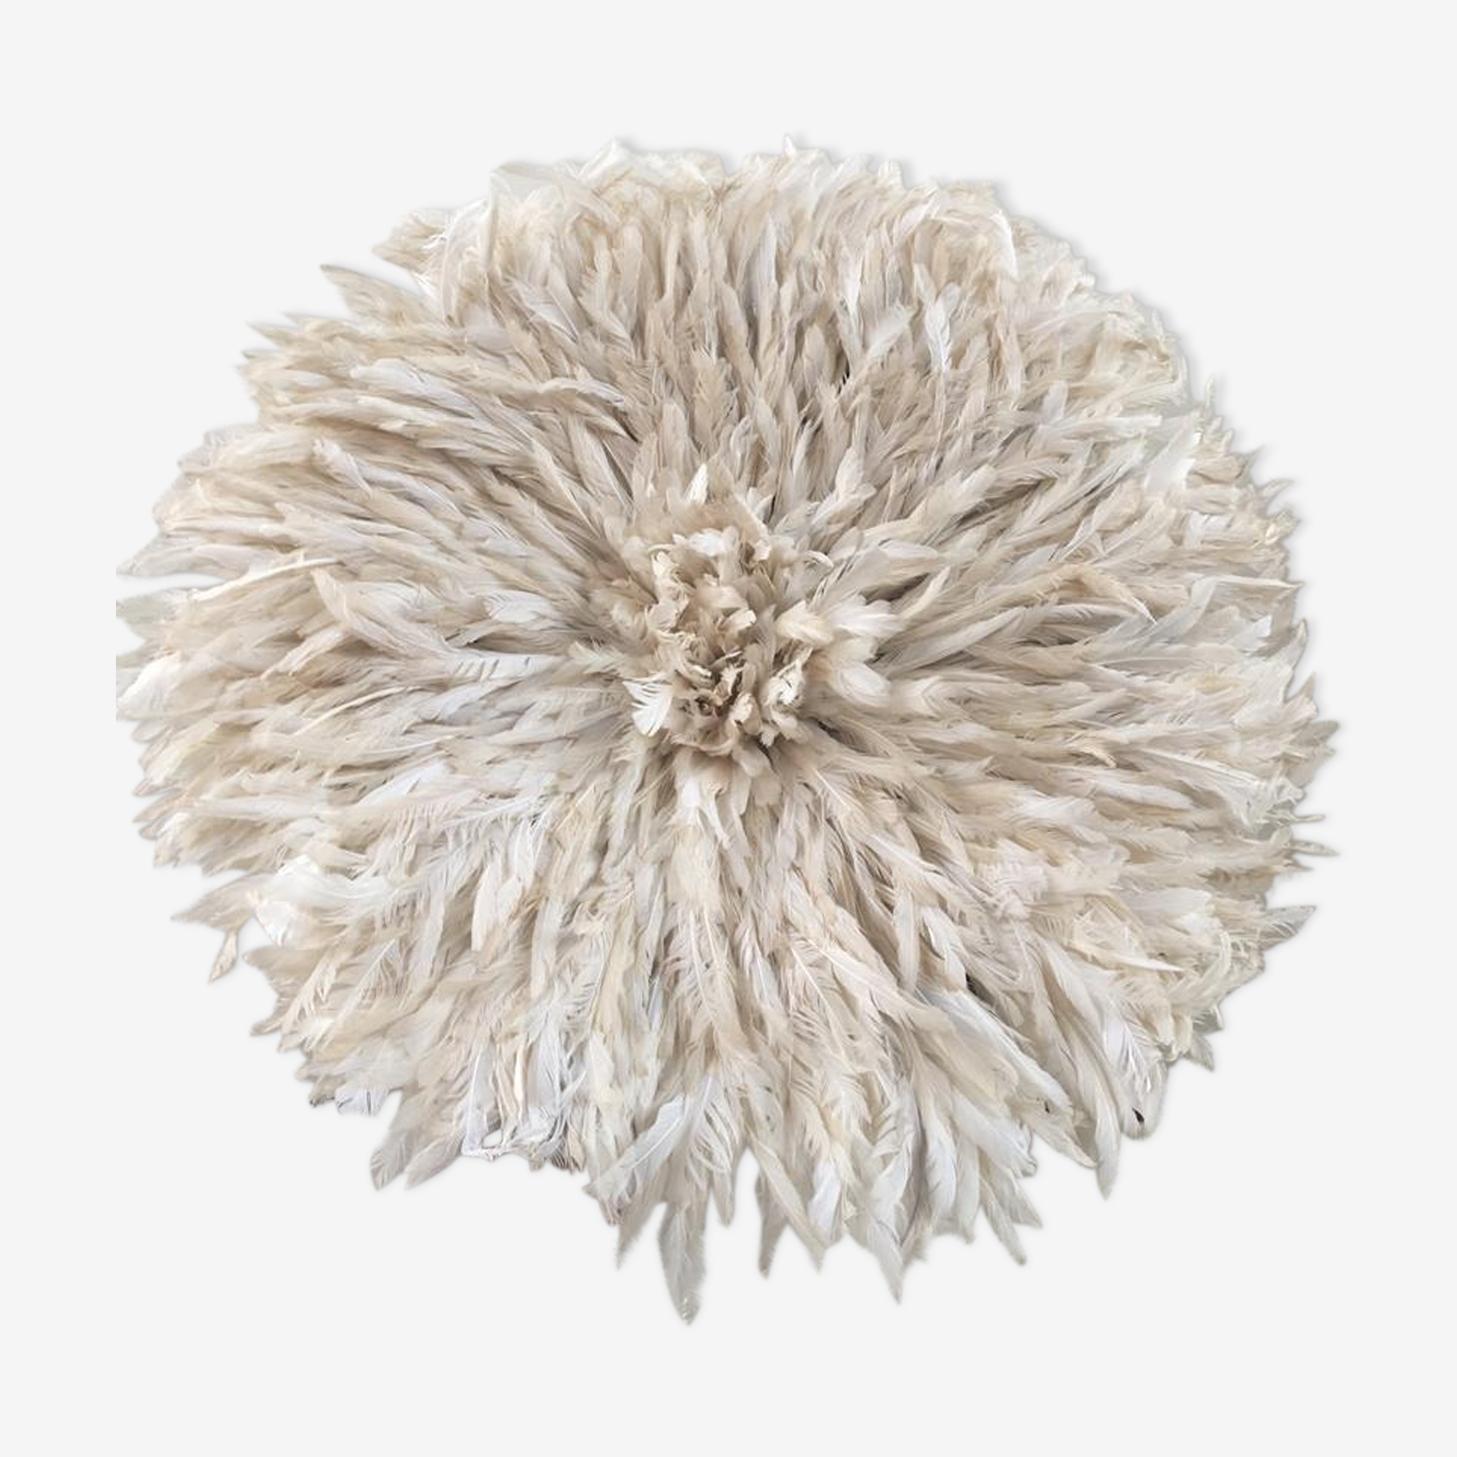 Juju hat blanc pure de 60 cm